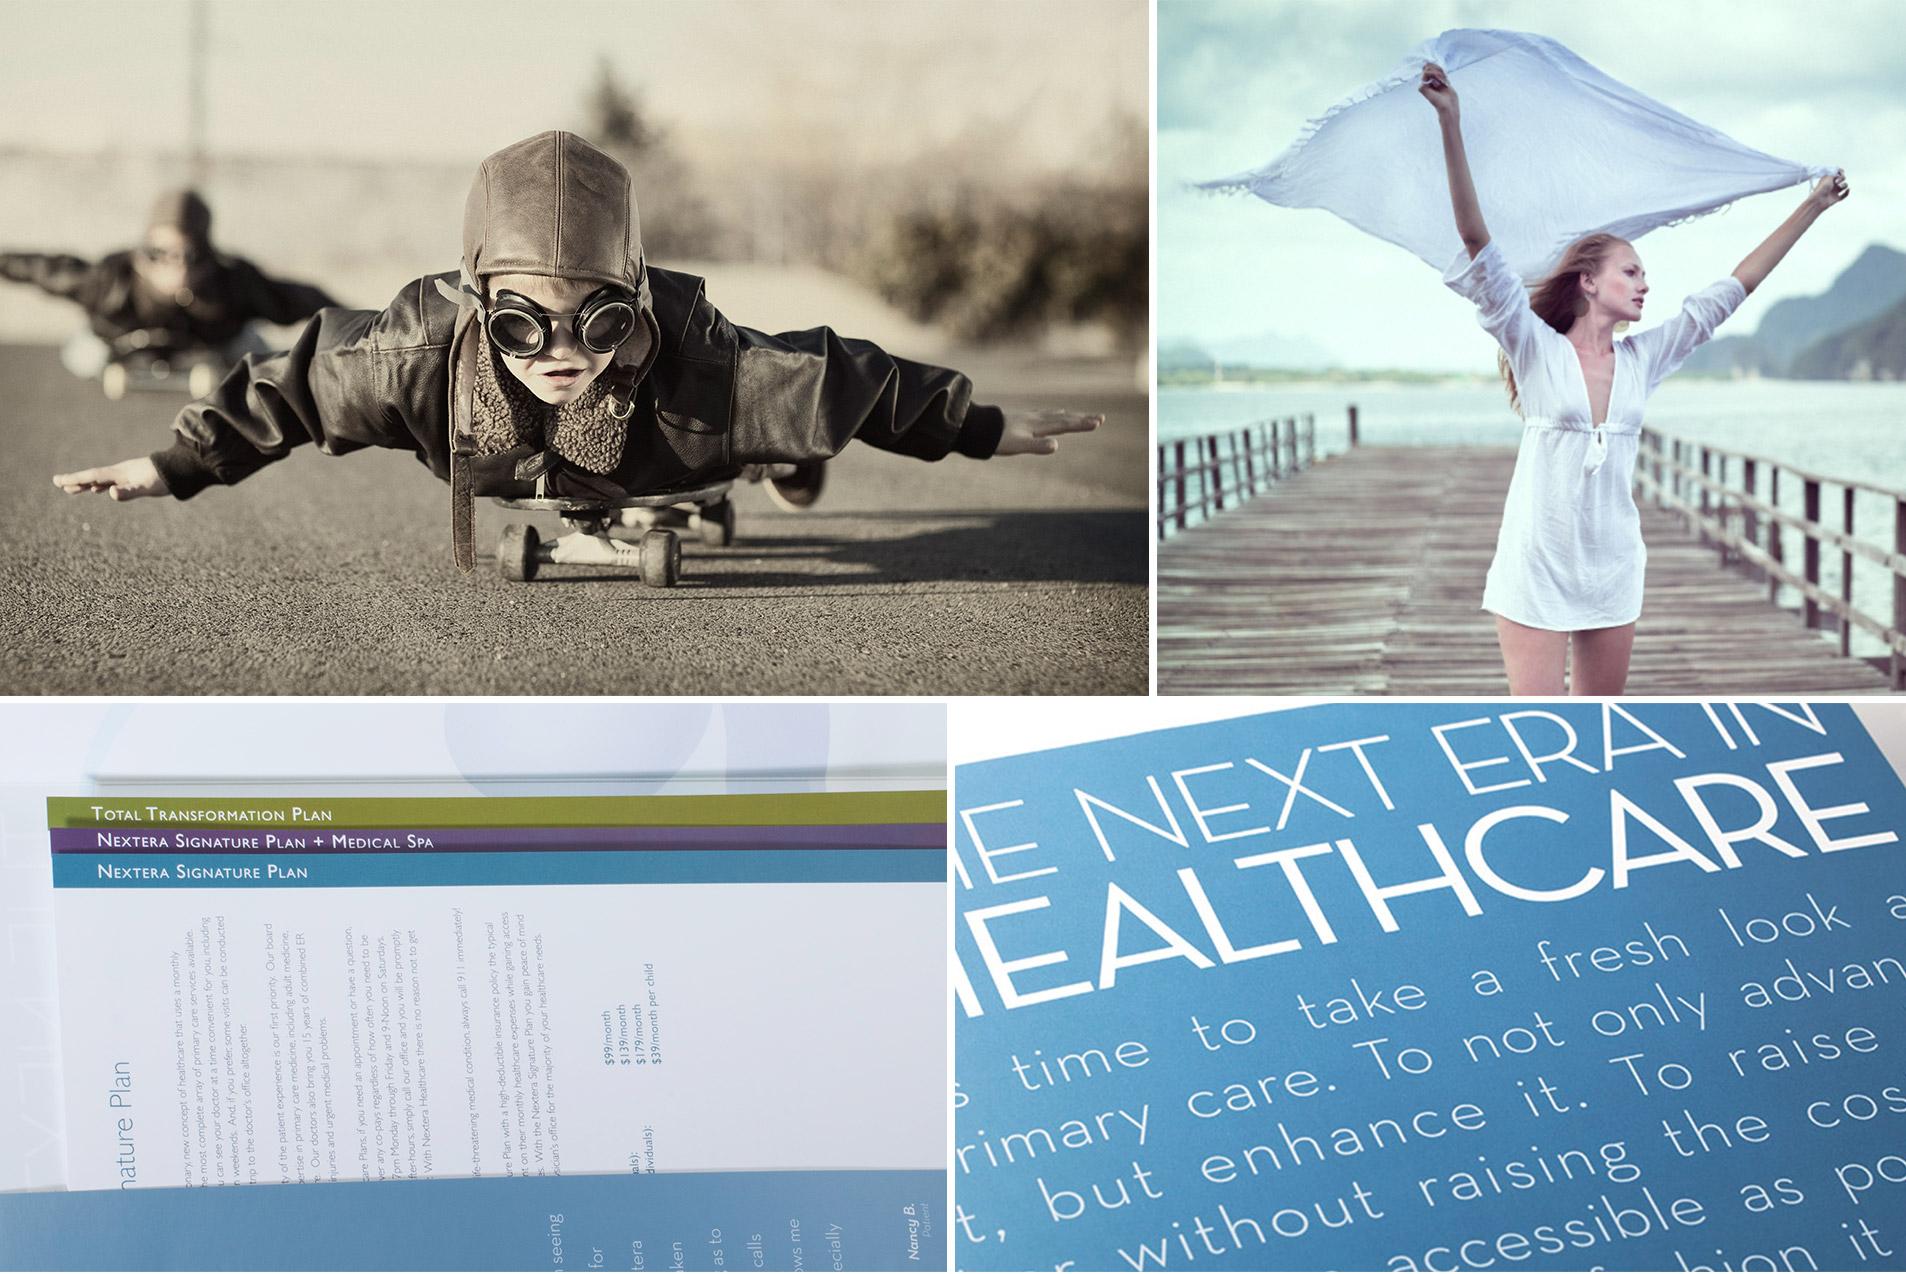 website design examples for nextera